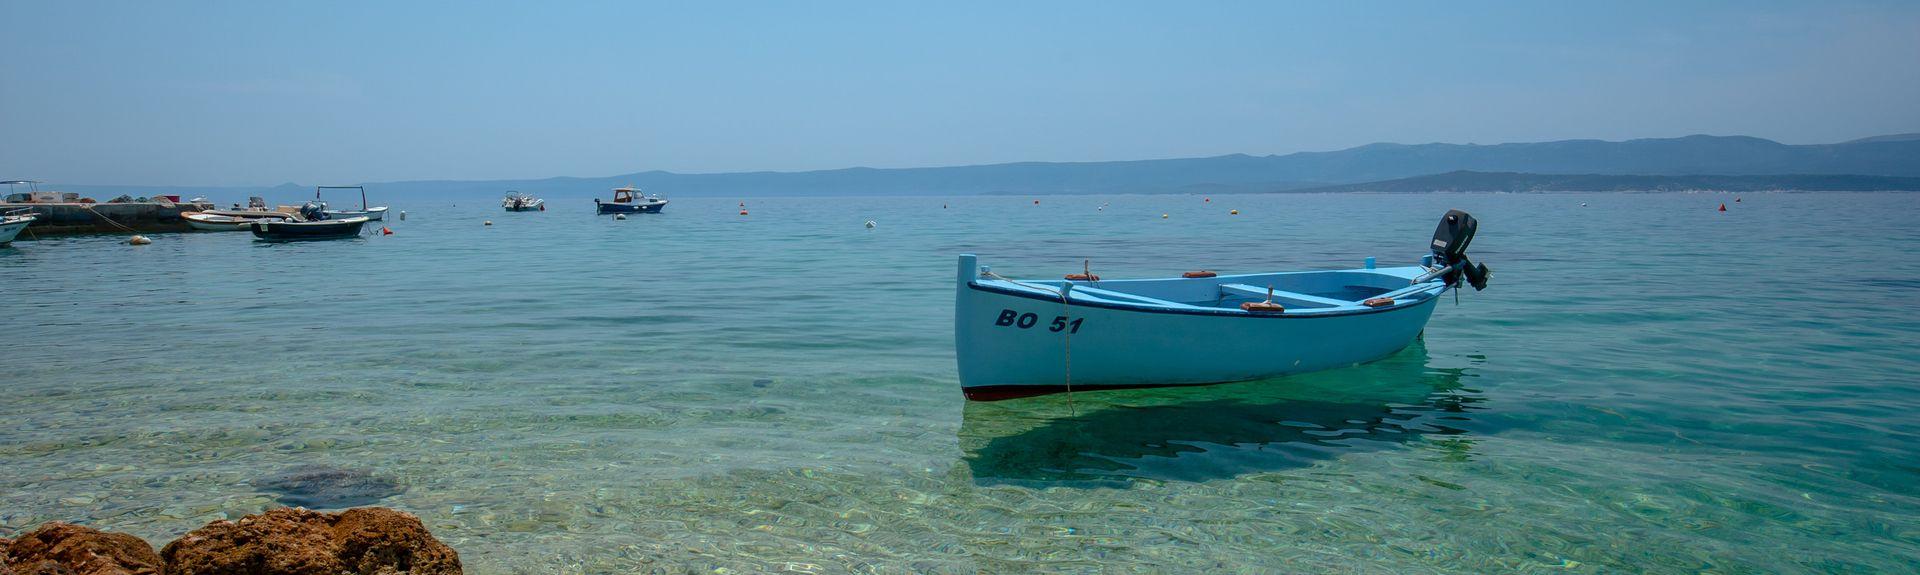 Ivan Dolac, Split-Dalmatia, Croácia